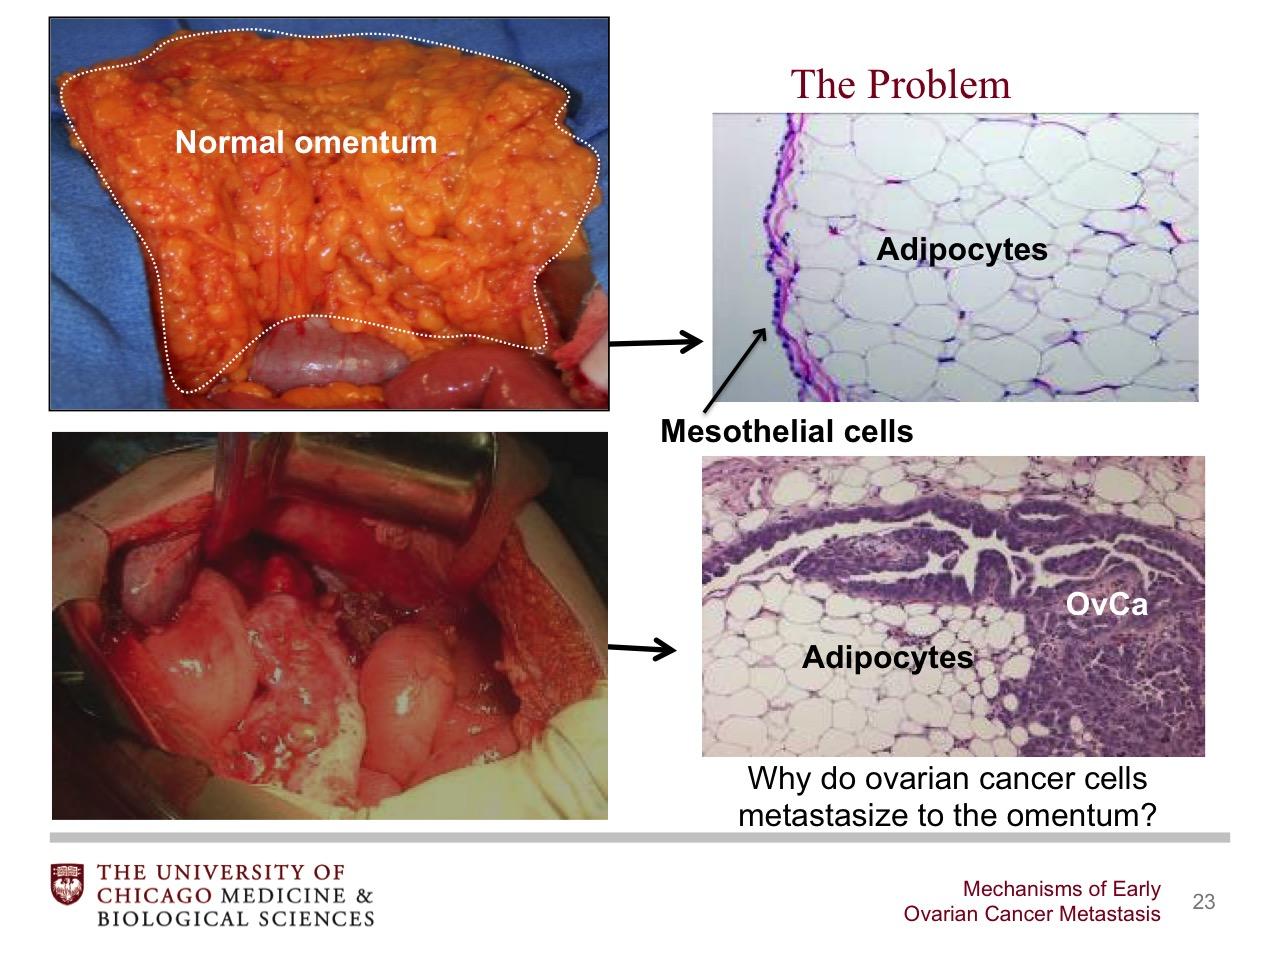 Mechanisms Of Early Ovarian Cancer Metastasis Broadcastmed